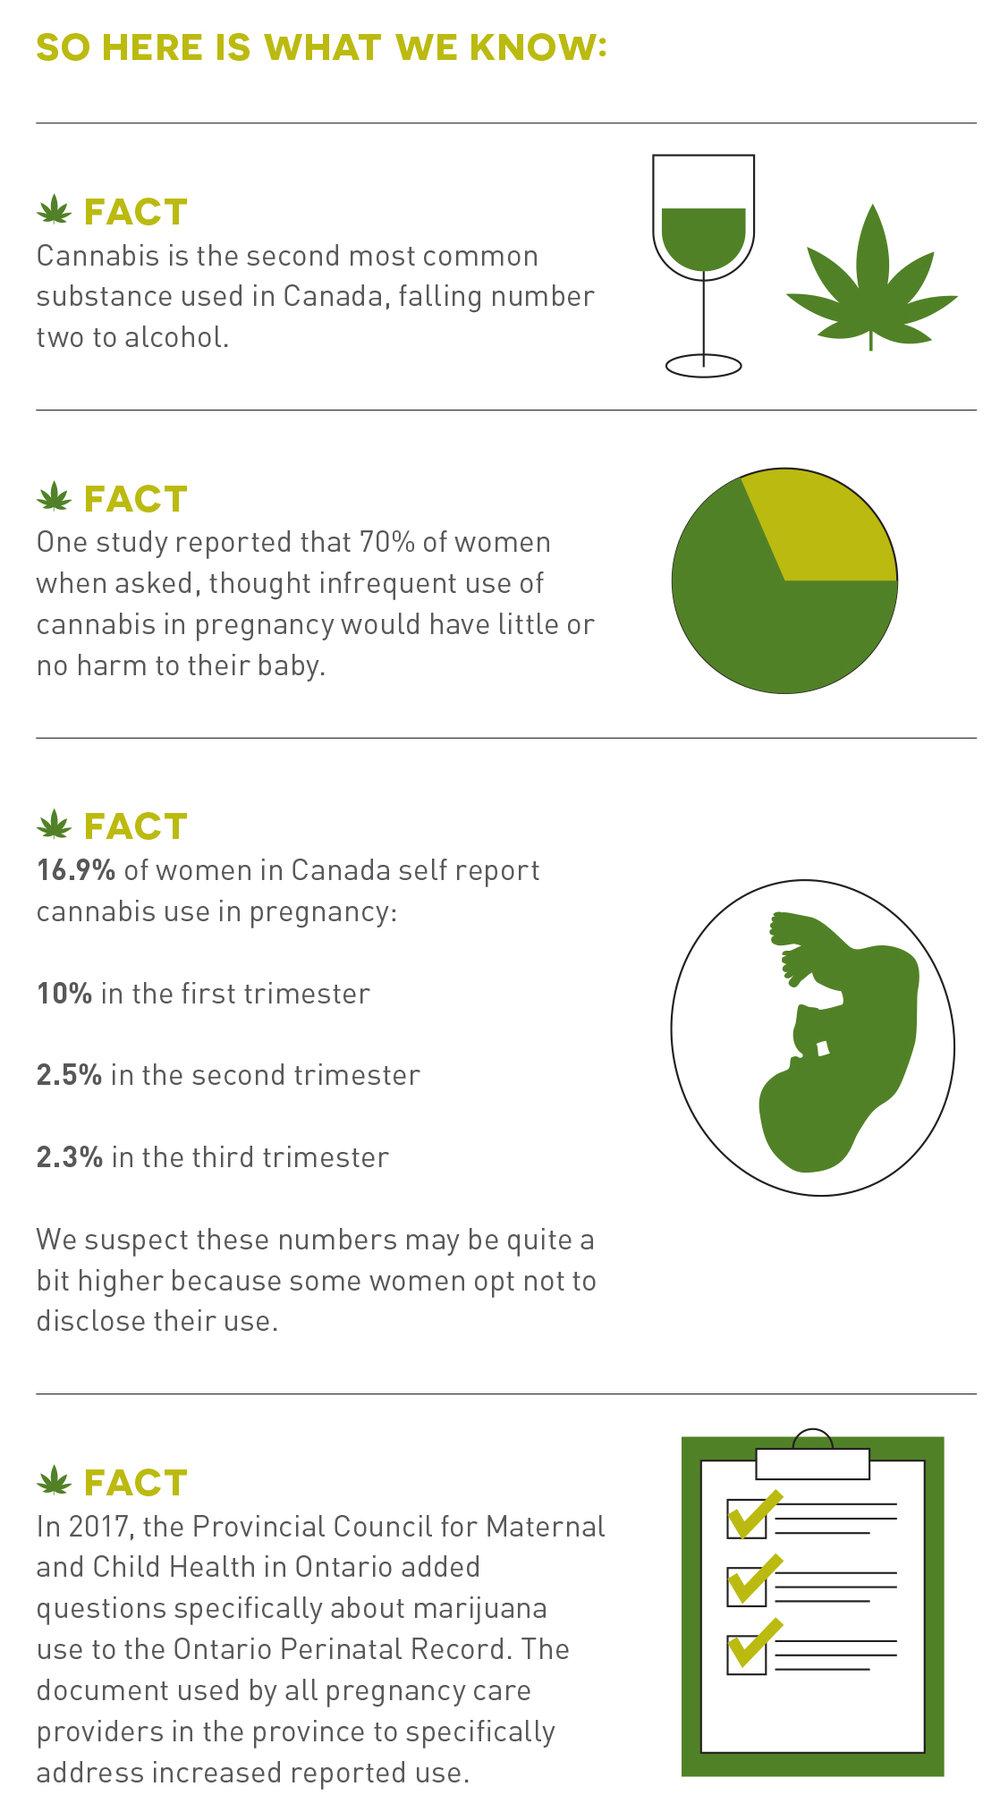 HolisticParent_Spring2019_21 - infographic.jpg